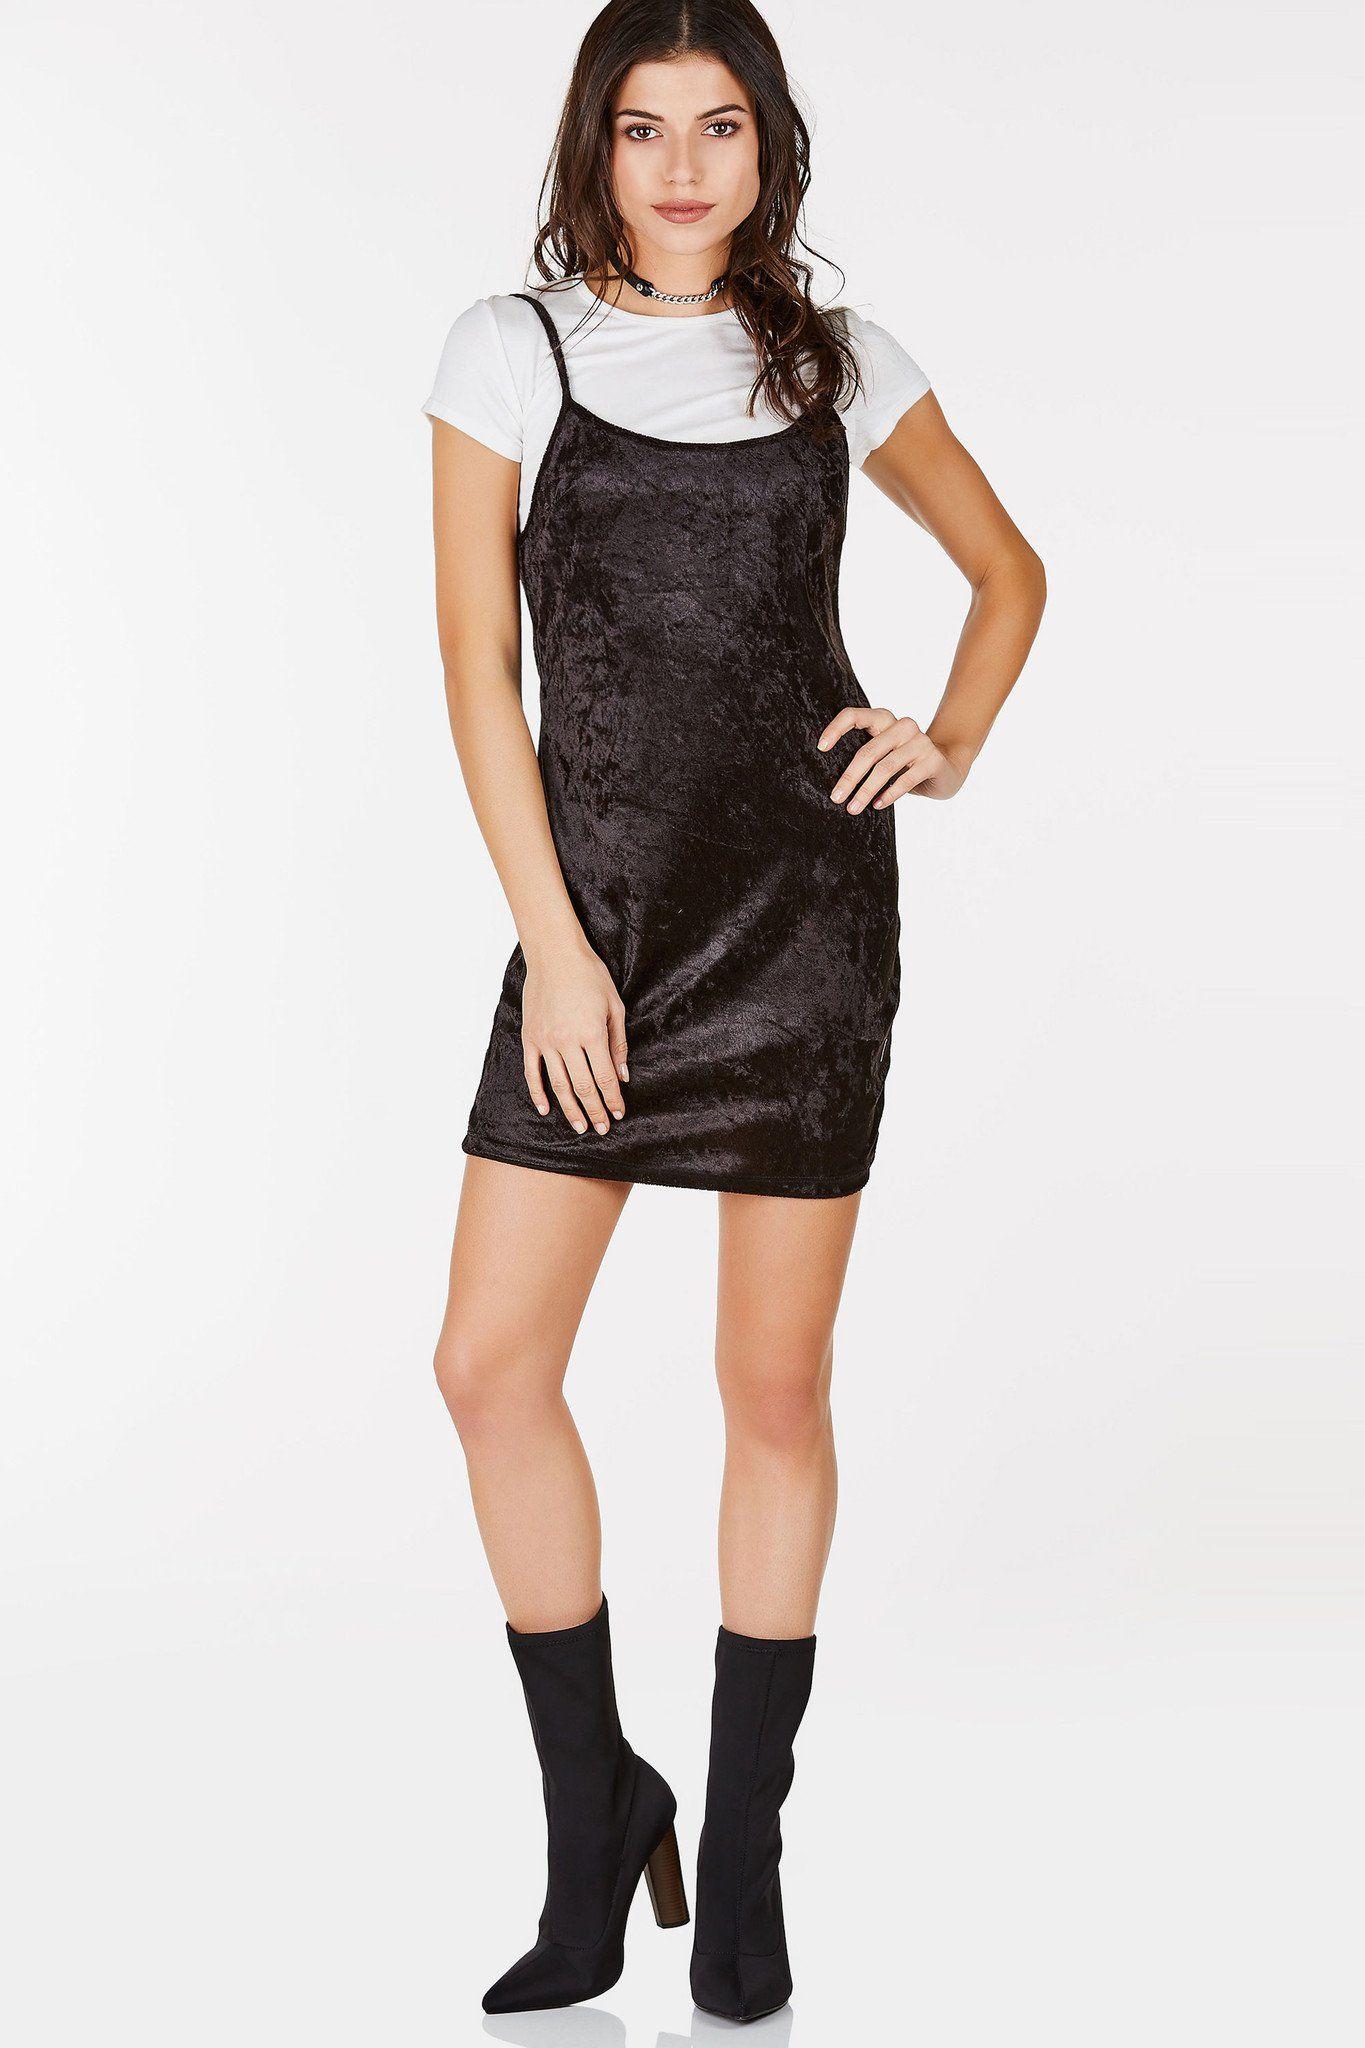 Basic Slip Dress With Velvet Finish Layered Over A Classic White T Shirt Layered Cami Slip Dress Dresses [ 2048 x 1365 Pixel ]